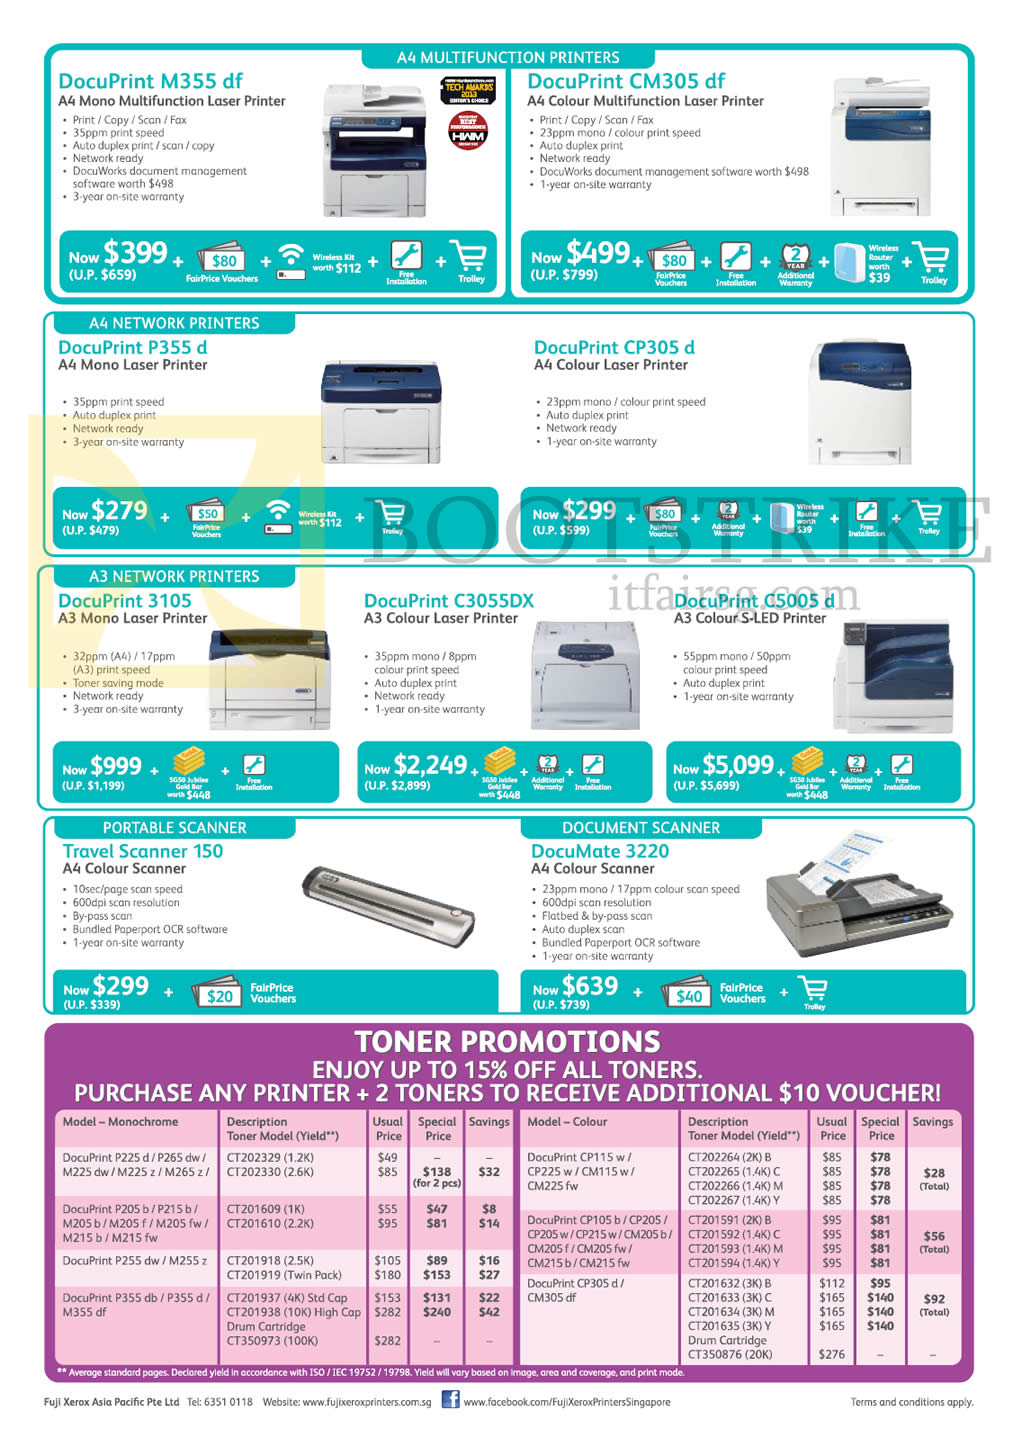 SITEX 2015 price list image brochure of Fuji Xerox Printers, Scanners, DocuPrint M355df, CM305df, P355d, CP305d, 3105, C3055DX, C5005d, Travel Scanner 150, DocuMate 3220, Toner